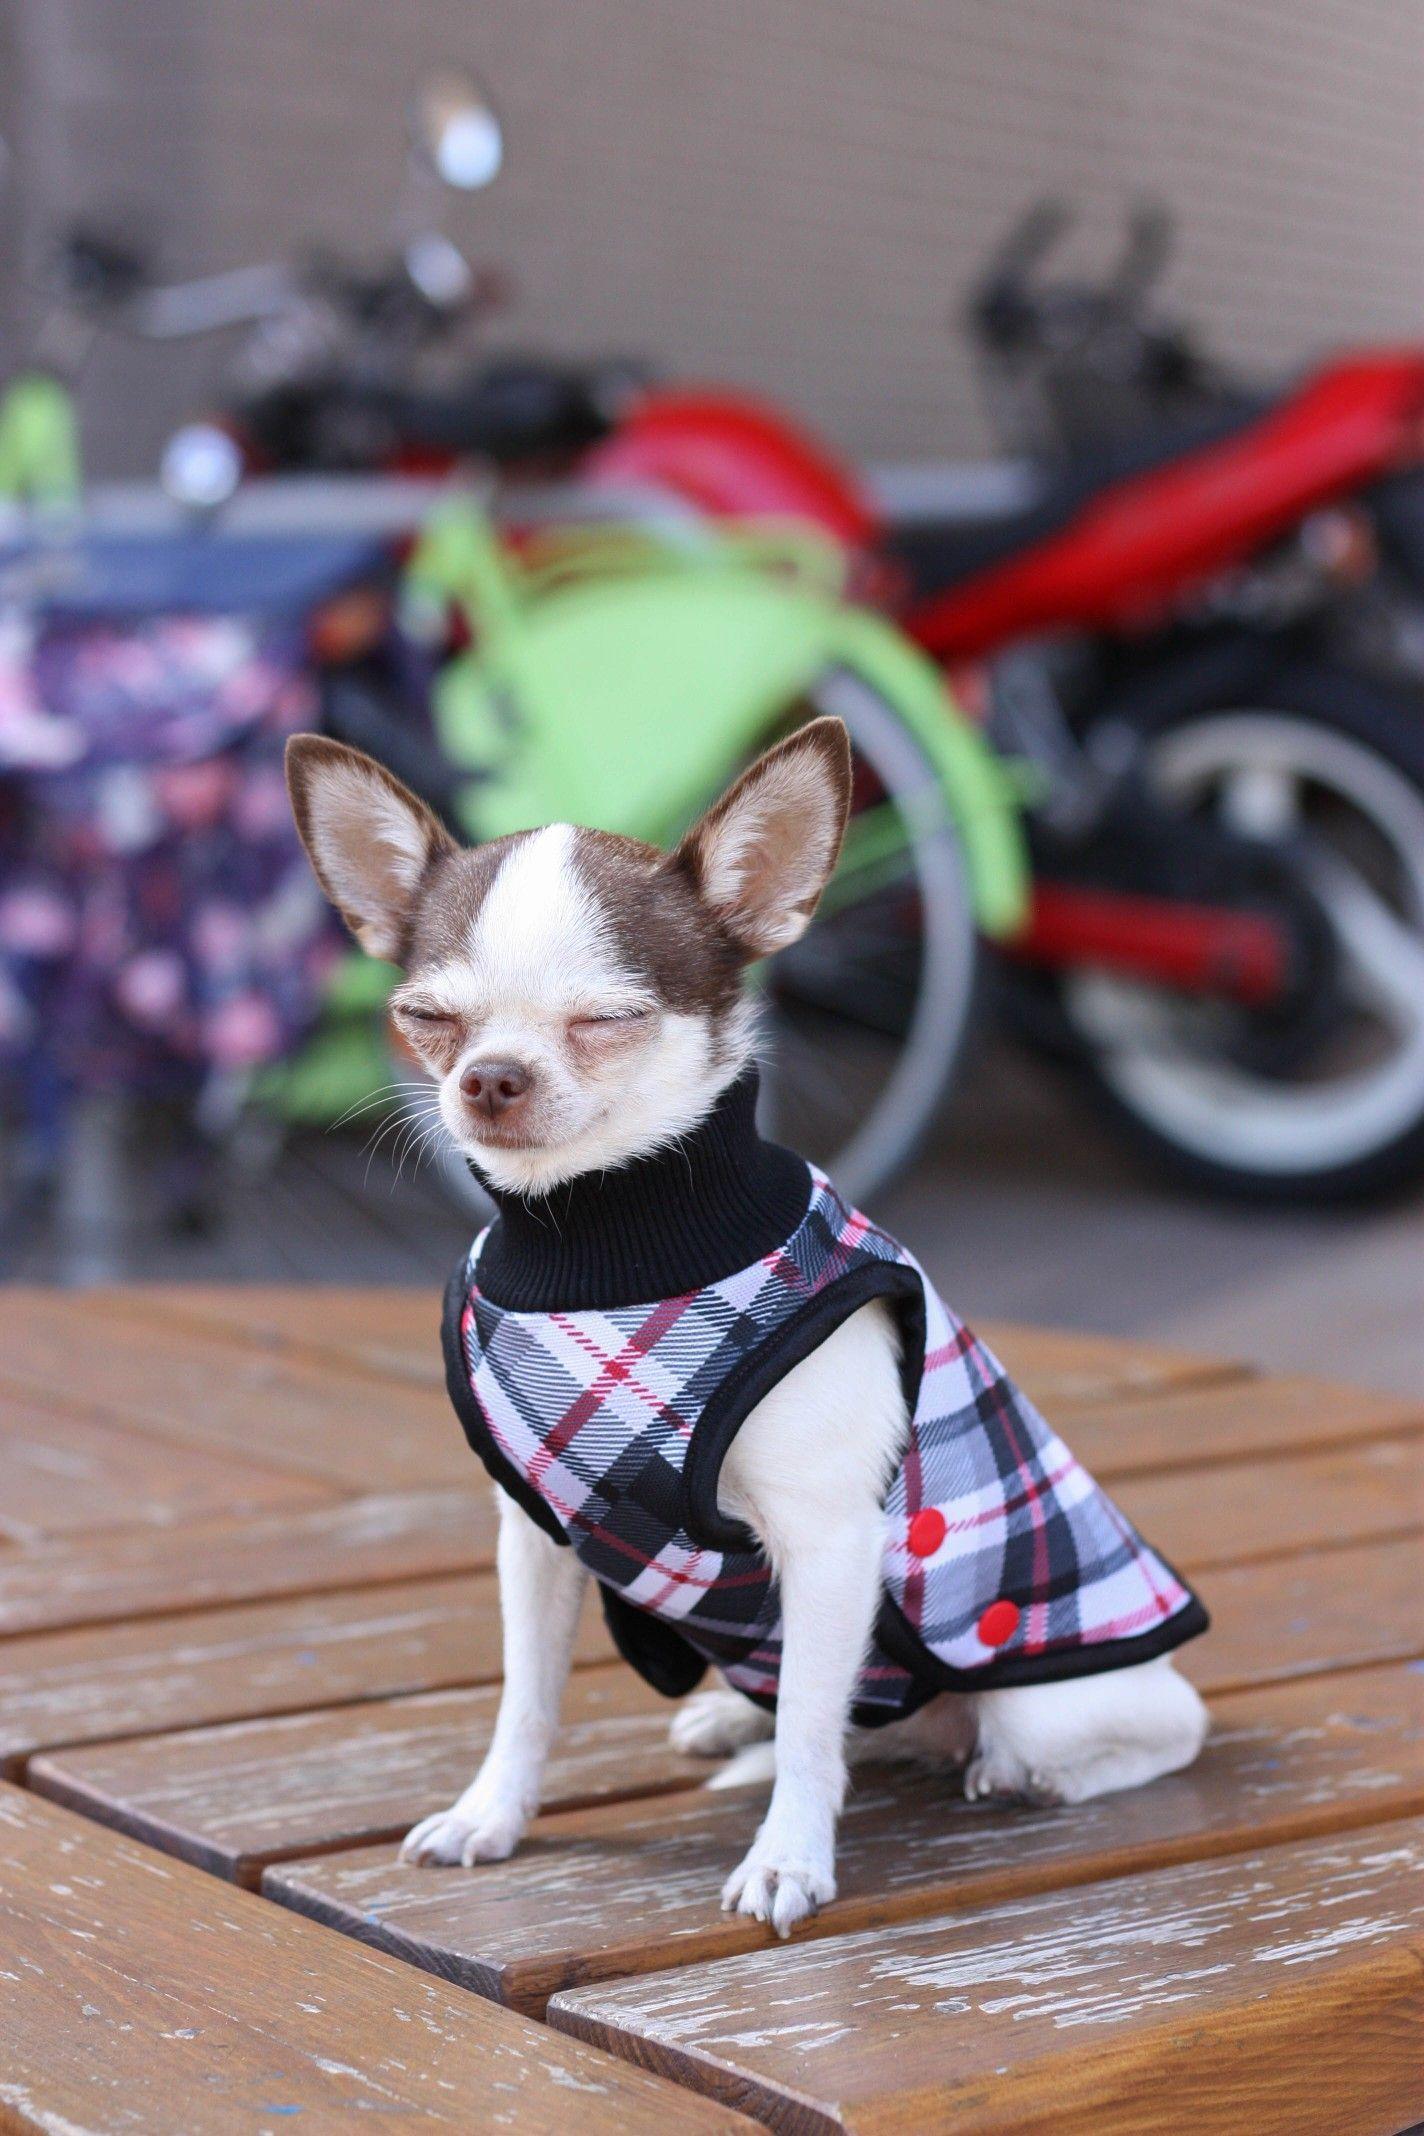 Cute Dog Dress Ruffle Crochet Dress For Pet Teacup Chihuahua